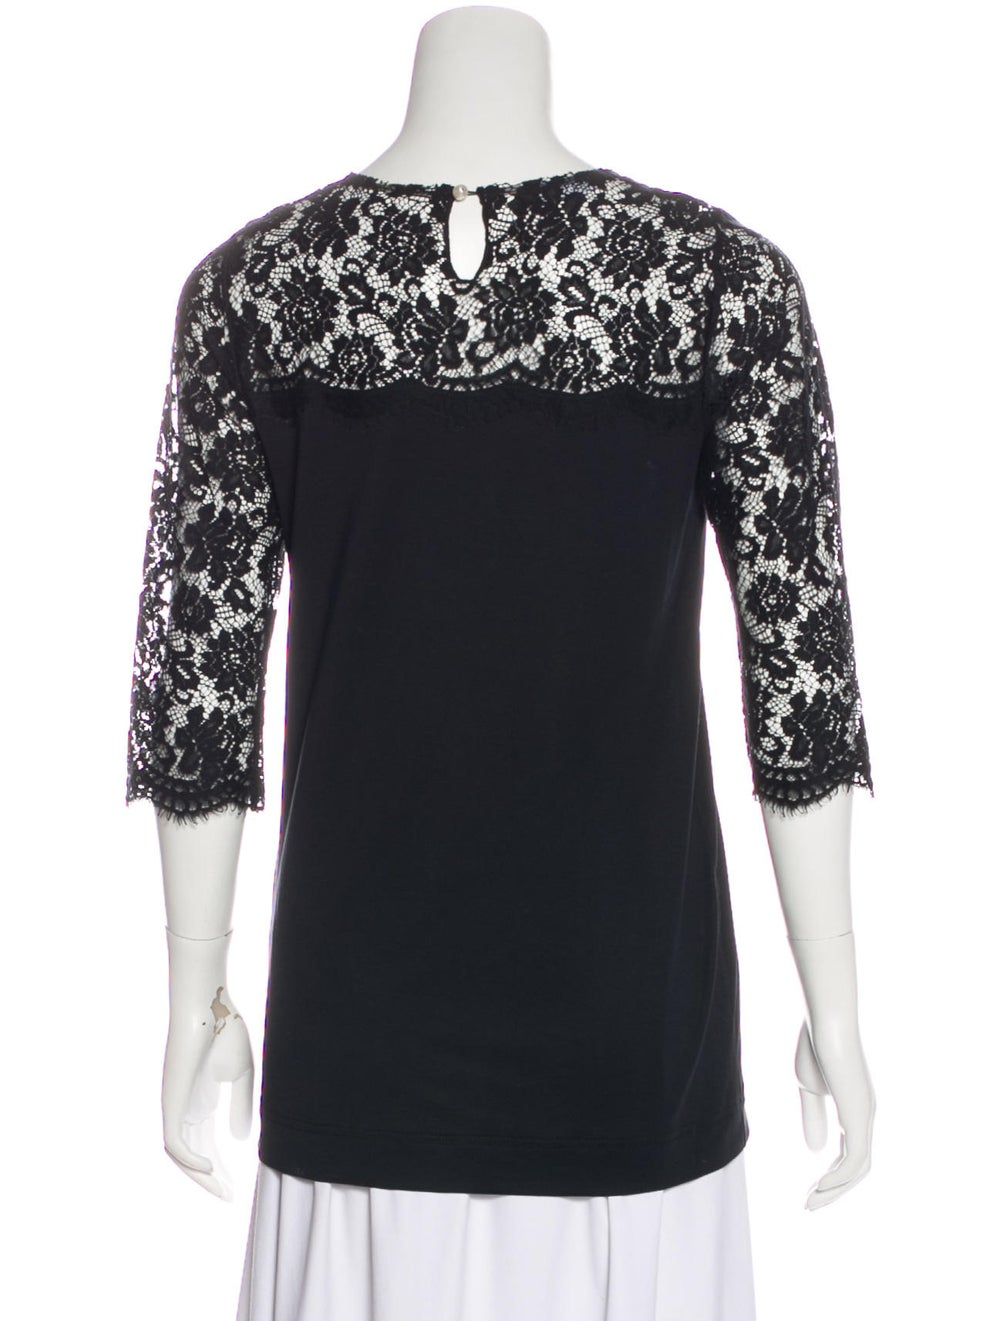 Dolce & Gabbana Long Sleeve Lace Knit Top Black - image 3